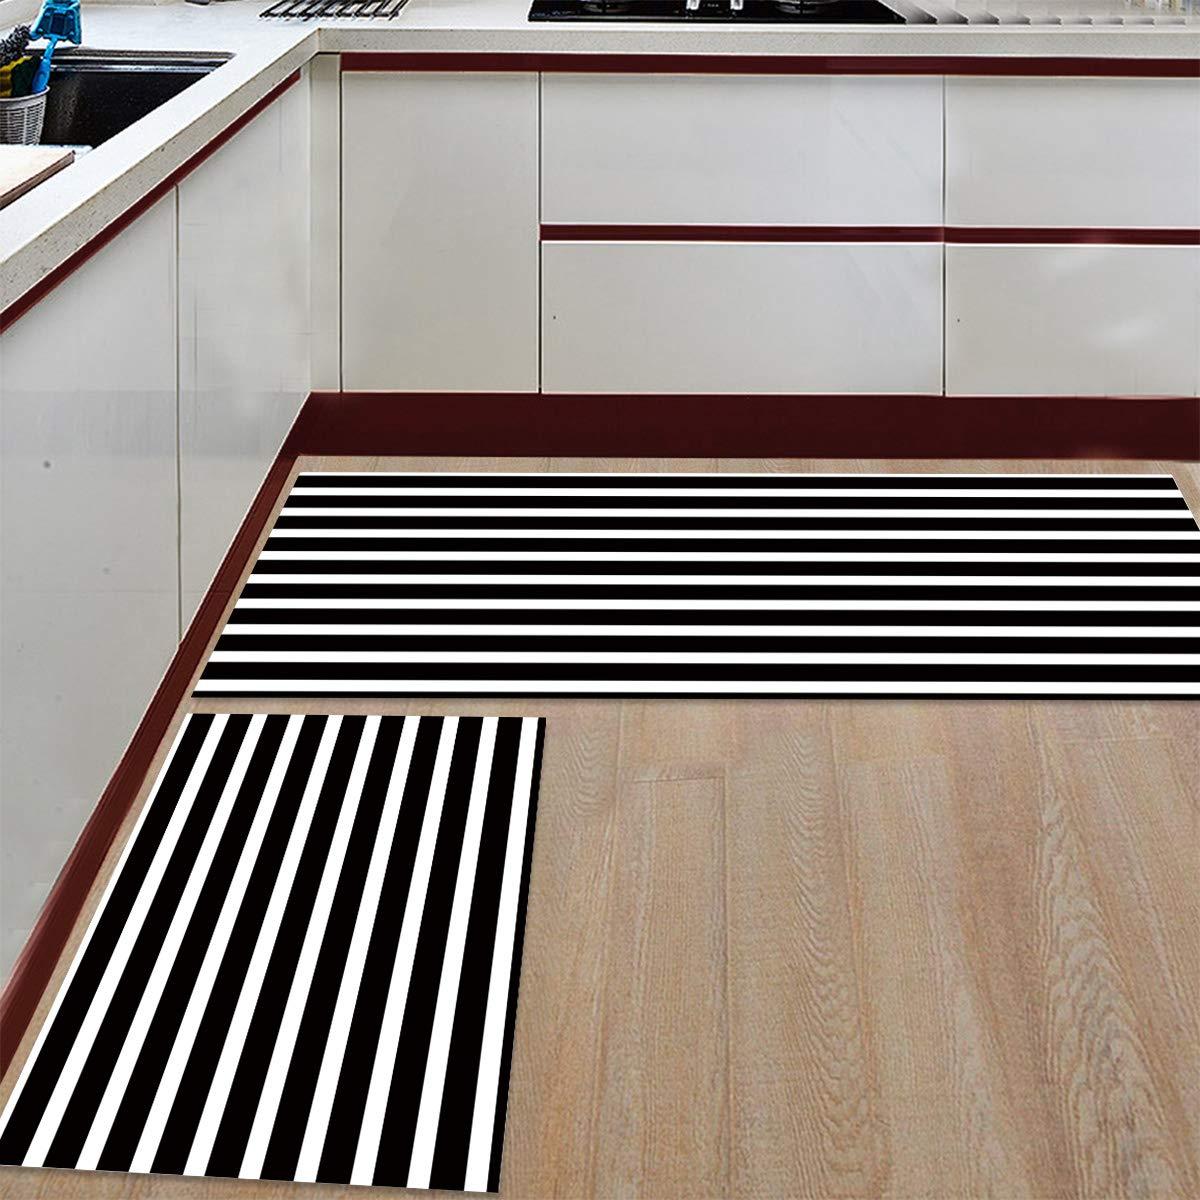 Kitchen Rug Set,Anti Fatigue Waterproof Non-Skid//Slip Washable Doormat Floor Runner Bathroom Area Rug Carpet Anchor Navy Chevron 15.7x23.6in+15.7x47.2in